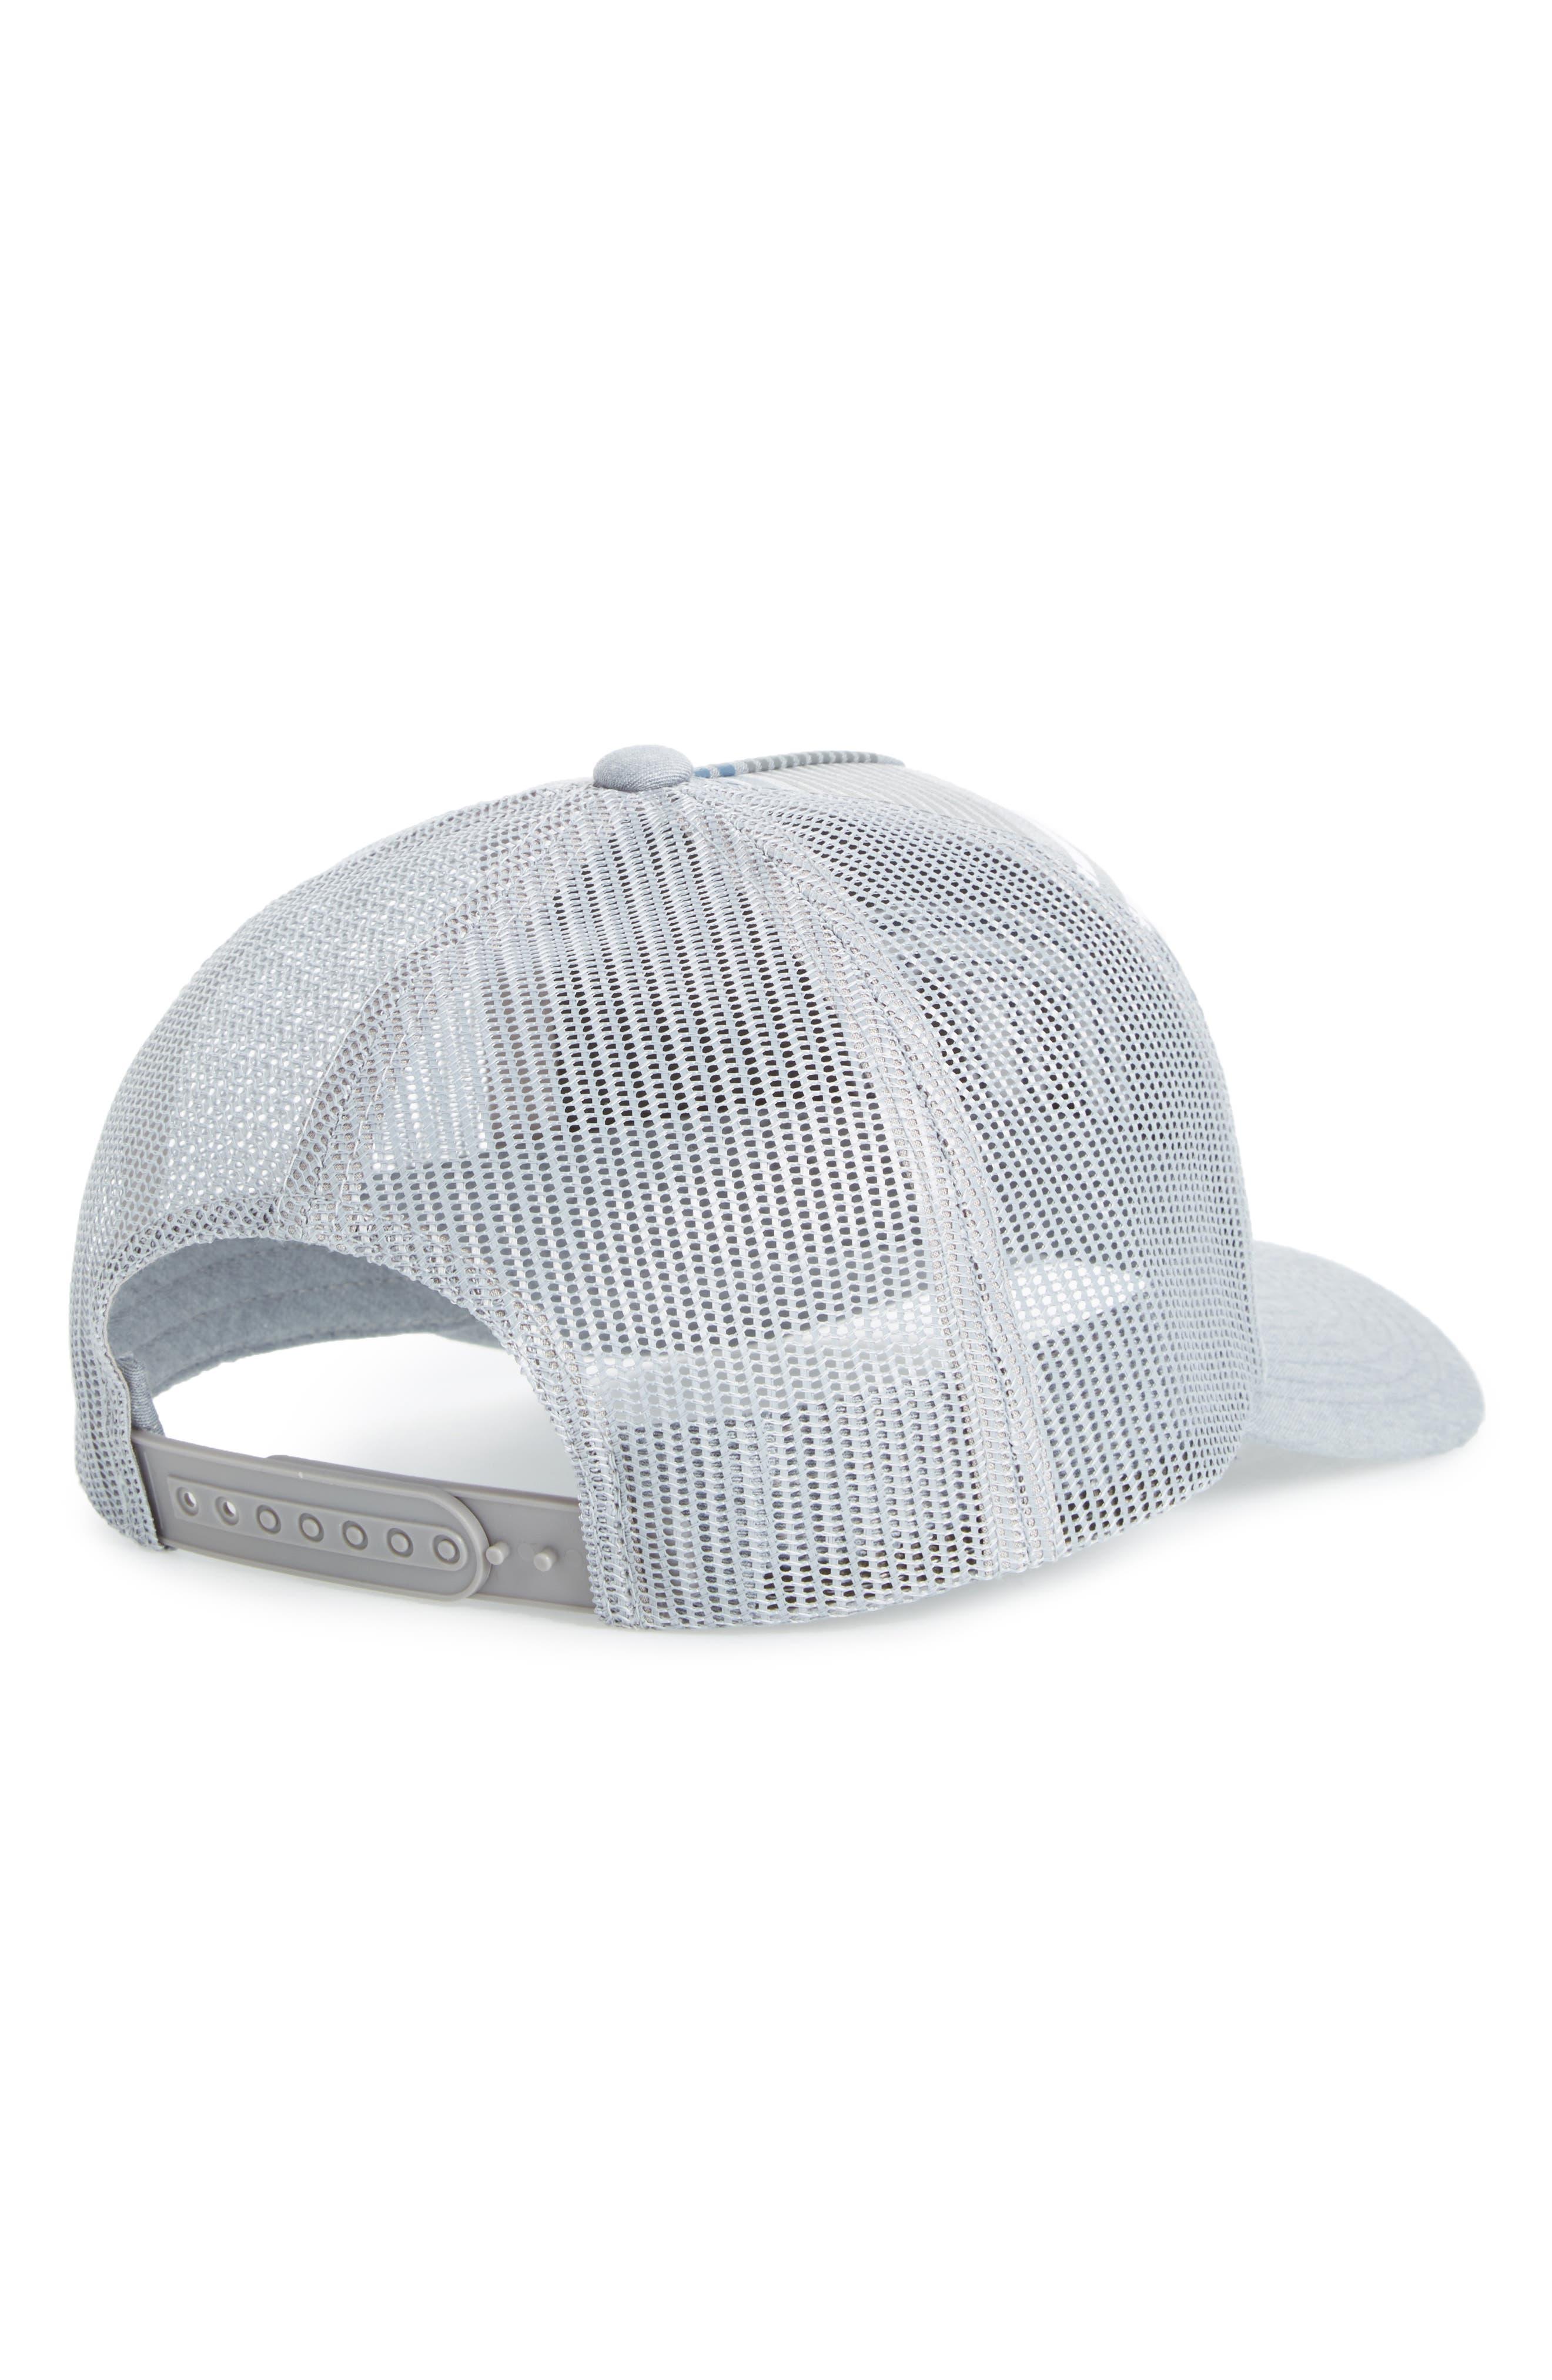 Kubiak Snapback Trucker Hat,                             Alternate thumbnail 2, color,                             Heather Quiet Shade